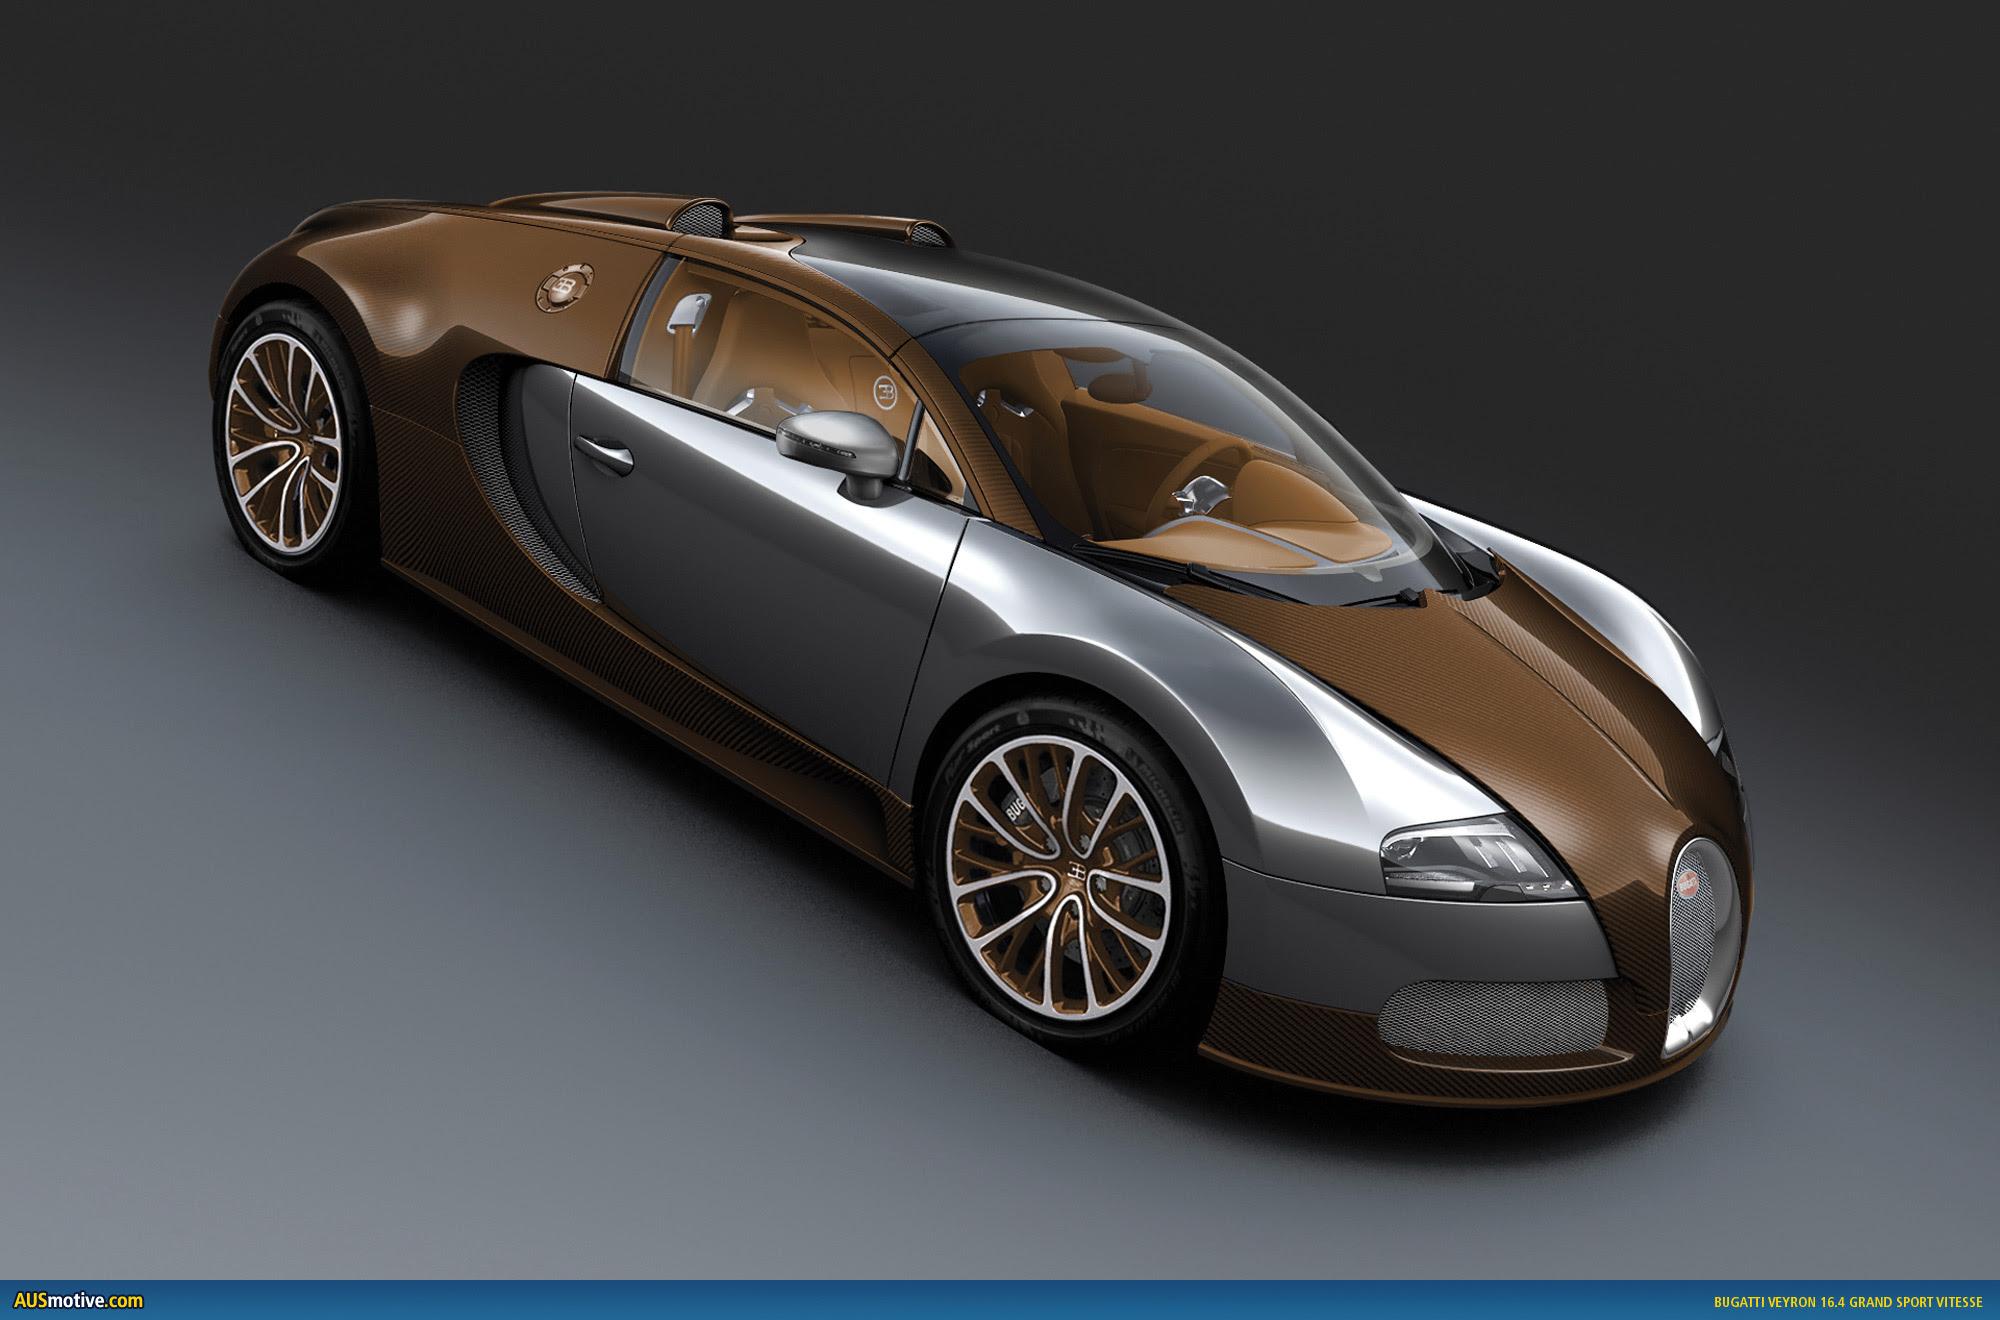 AUSmotive.com \u00bb Bugatti Veyron 16.4 Grand Sport Vitesse